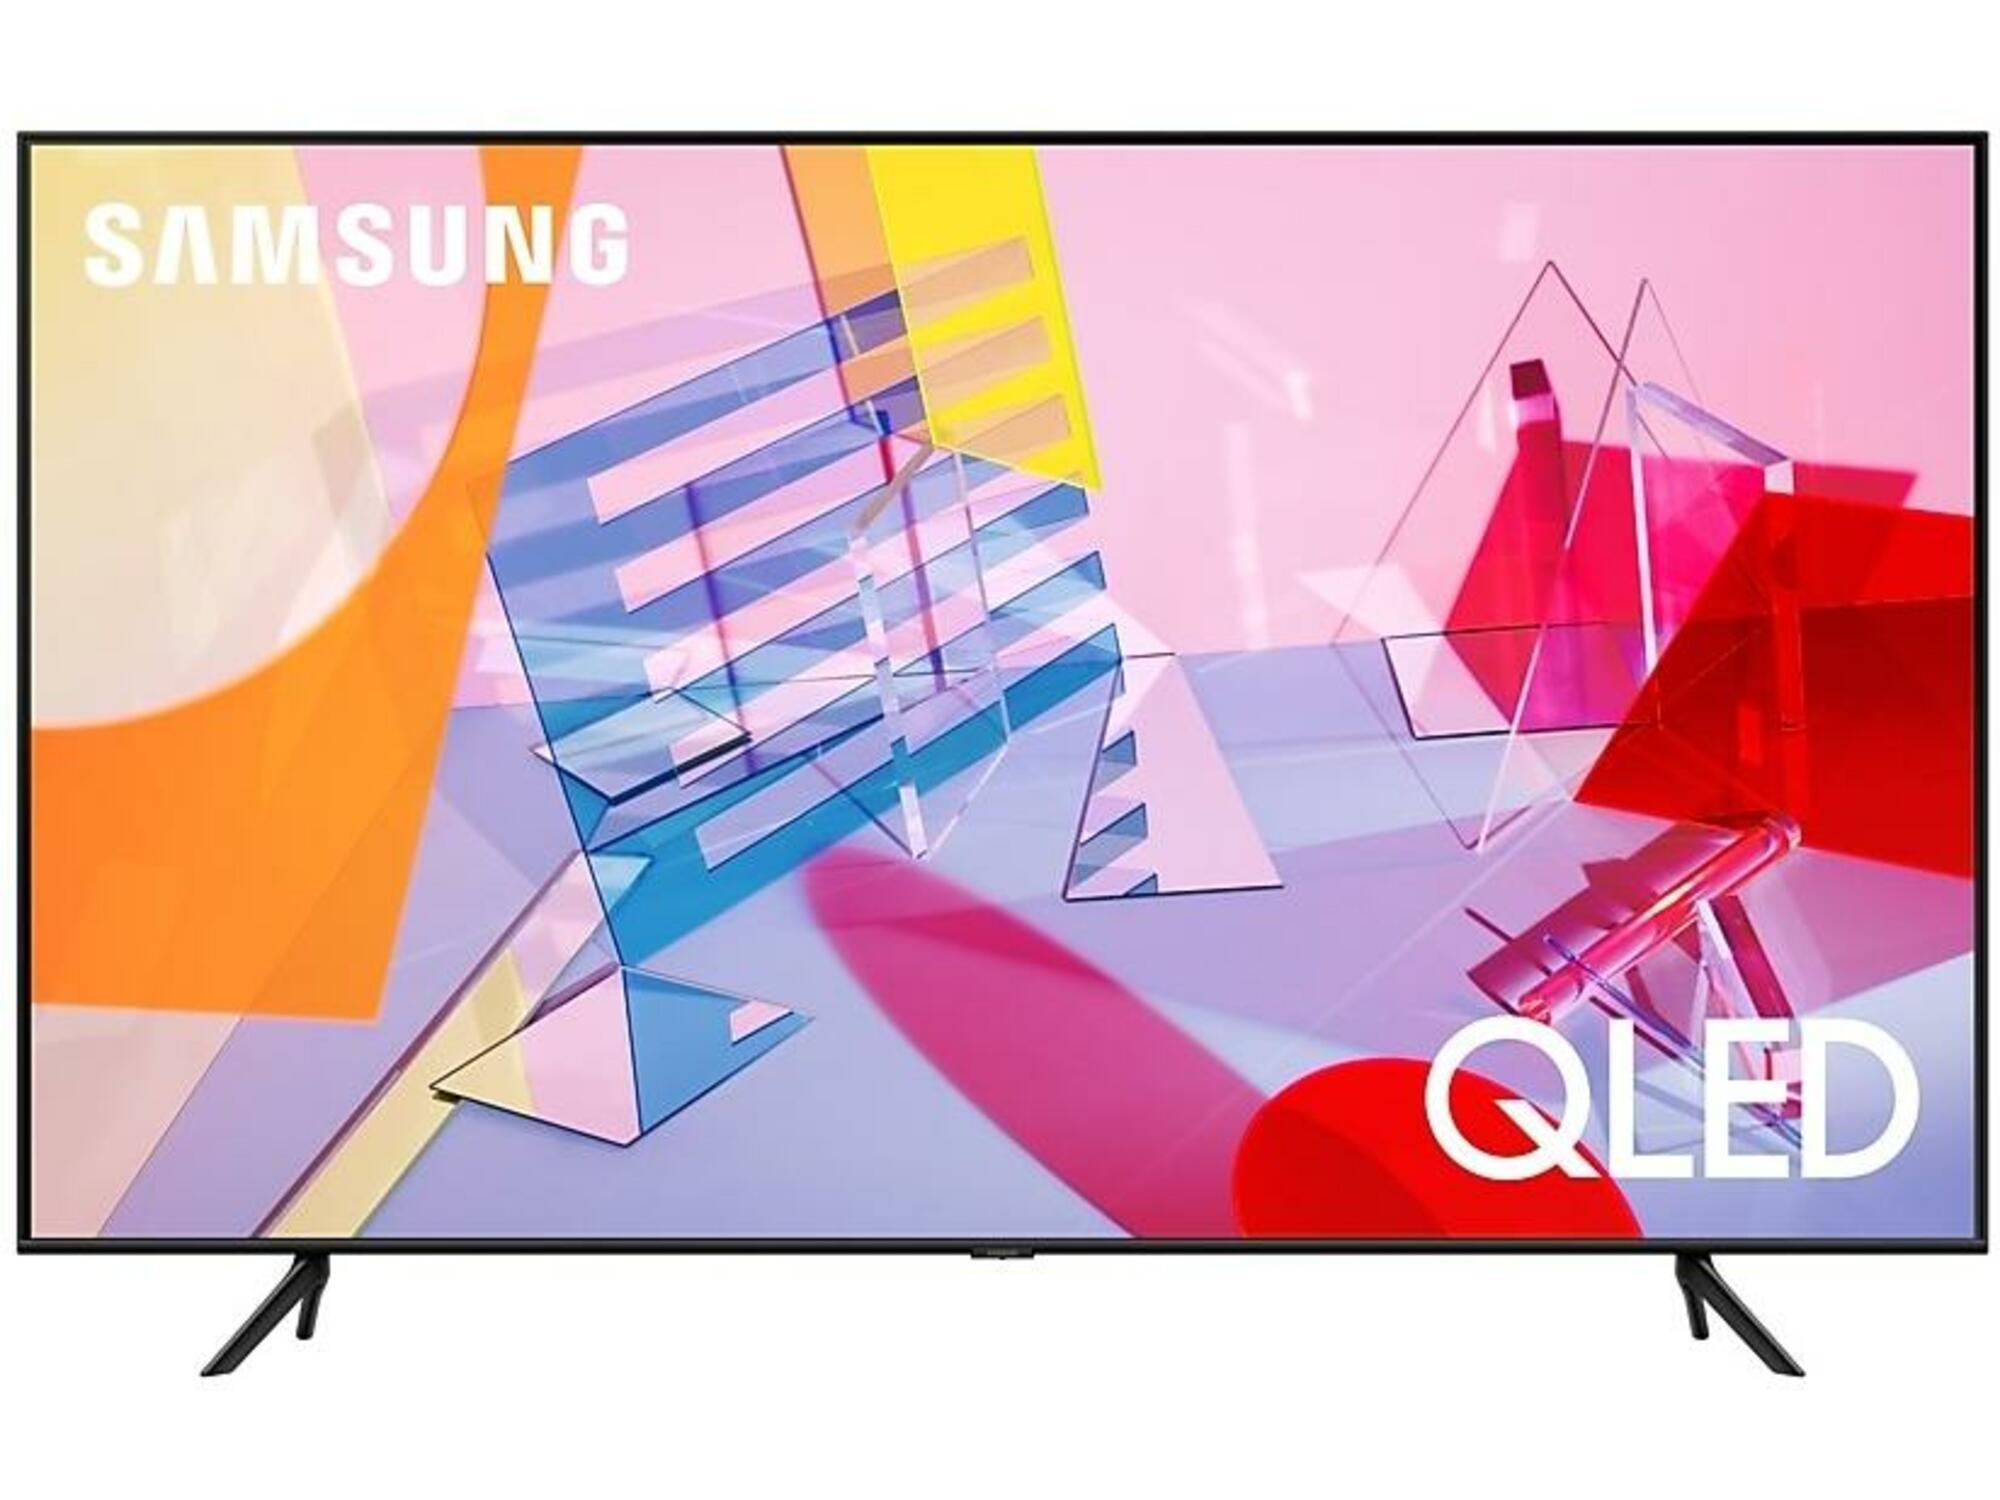 SAMSUNG QLED TV sprejemnik Smart 55Q60TAU (QE55Q60TAUXXH) 139cm